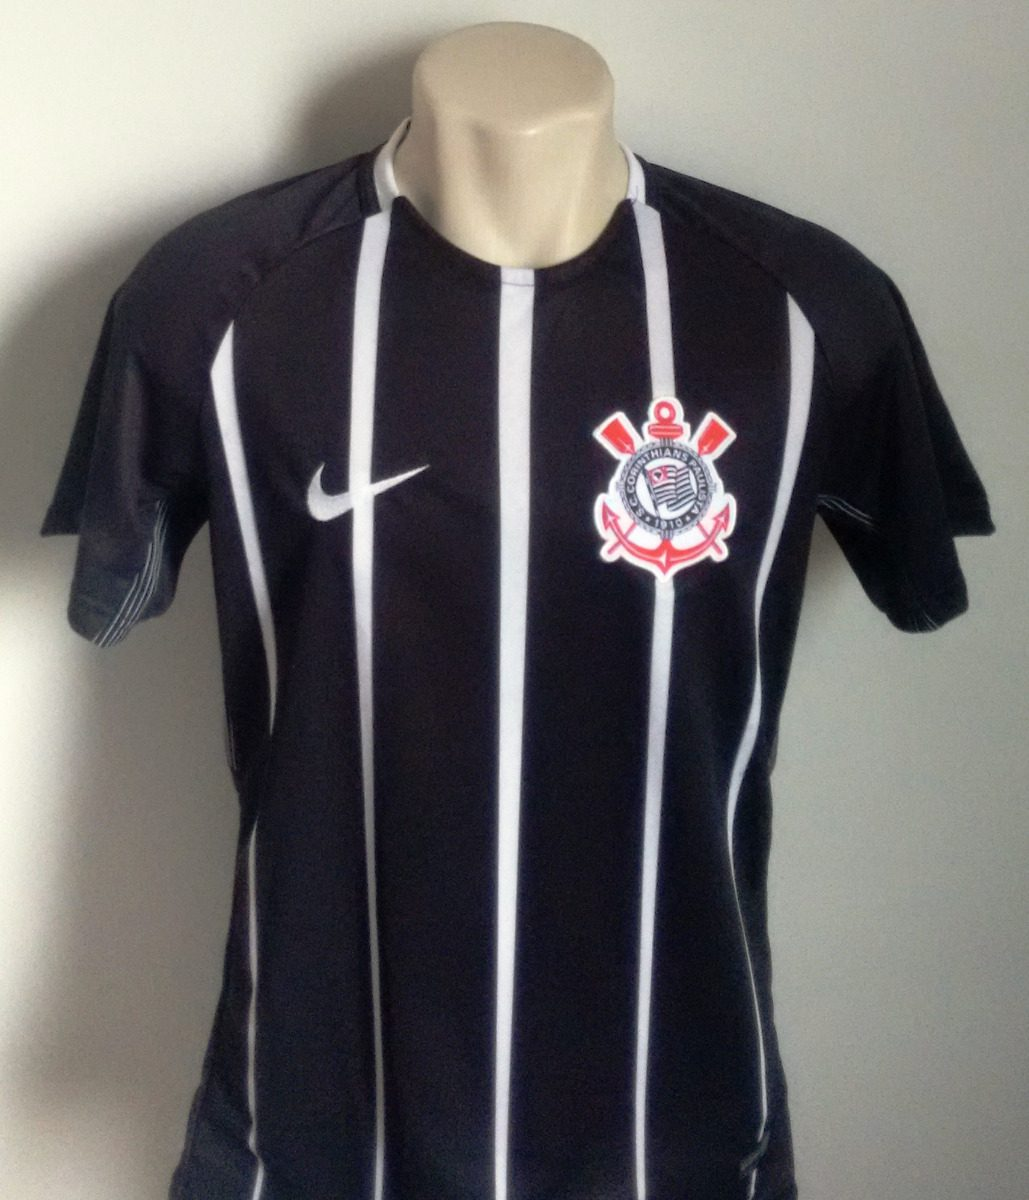 03b6c10761d04 Camisa Futebol Corinthians Away 2017 18 - Número 7 - R  60